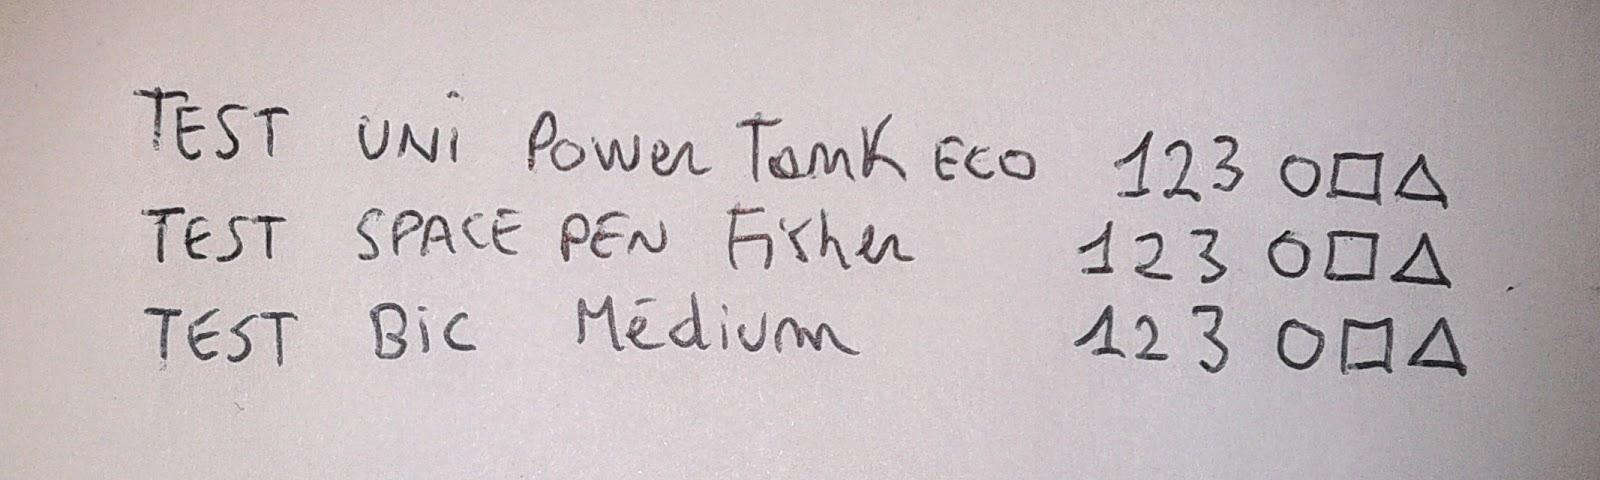 test-scrittura-uniball-power-tank-space-pen-bic